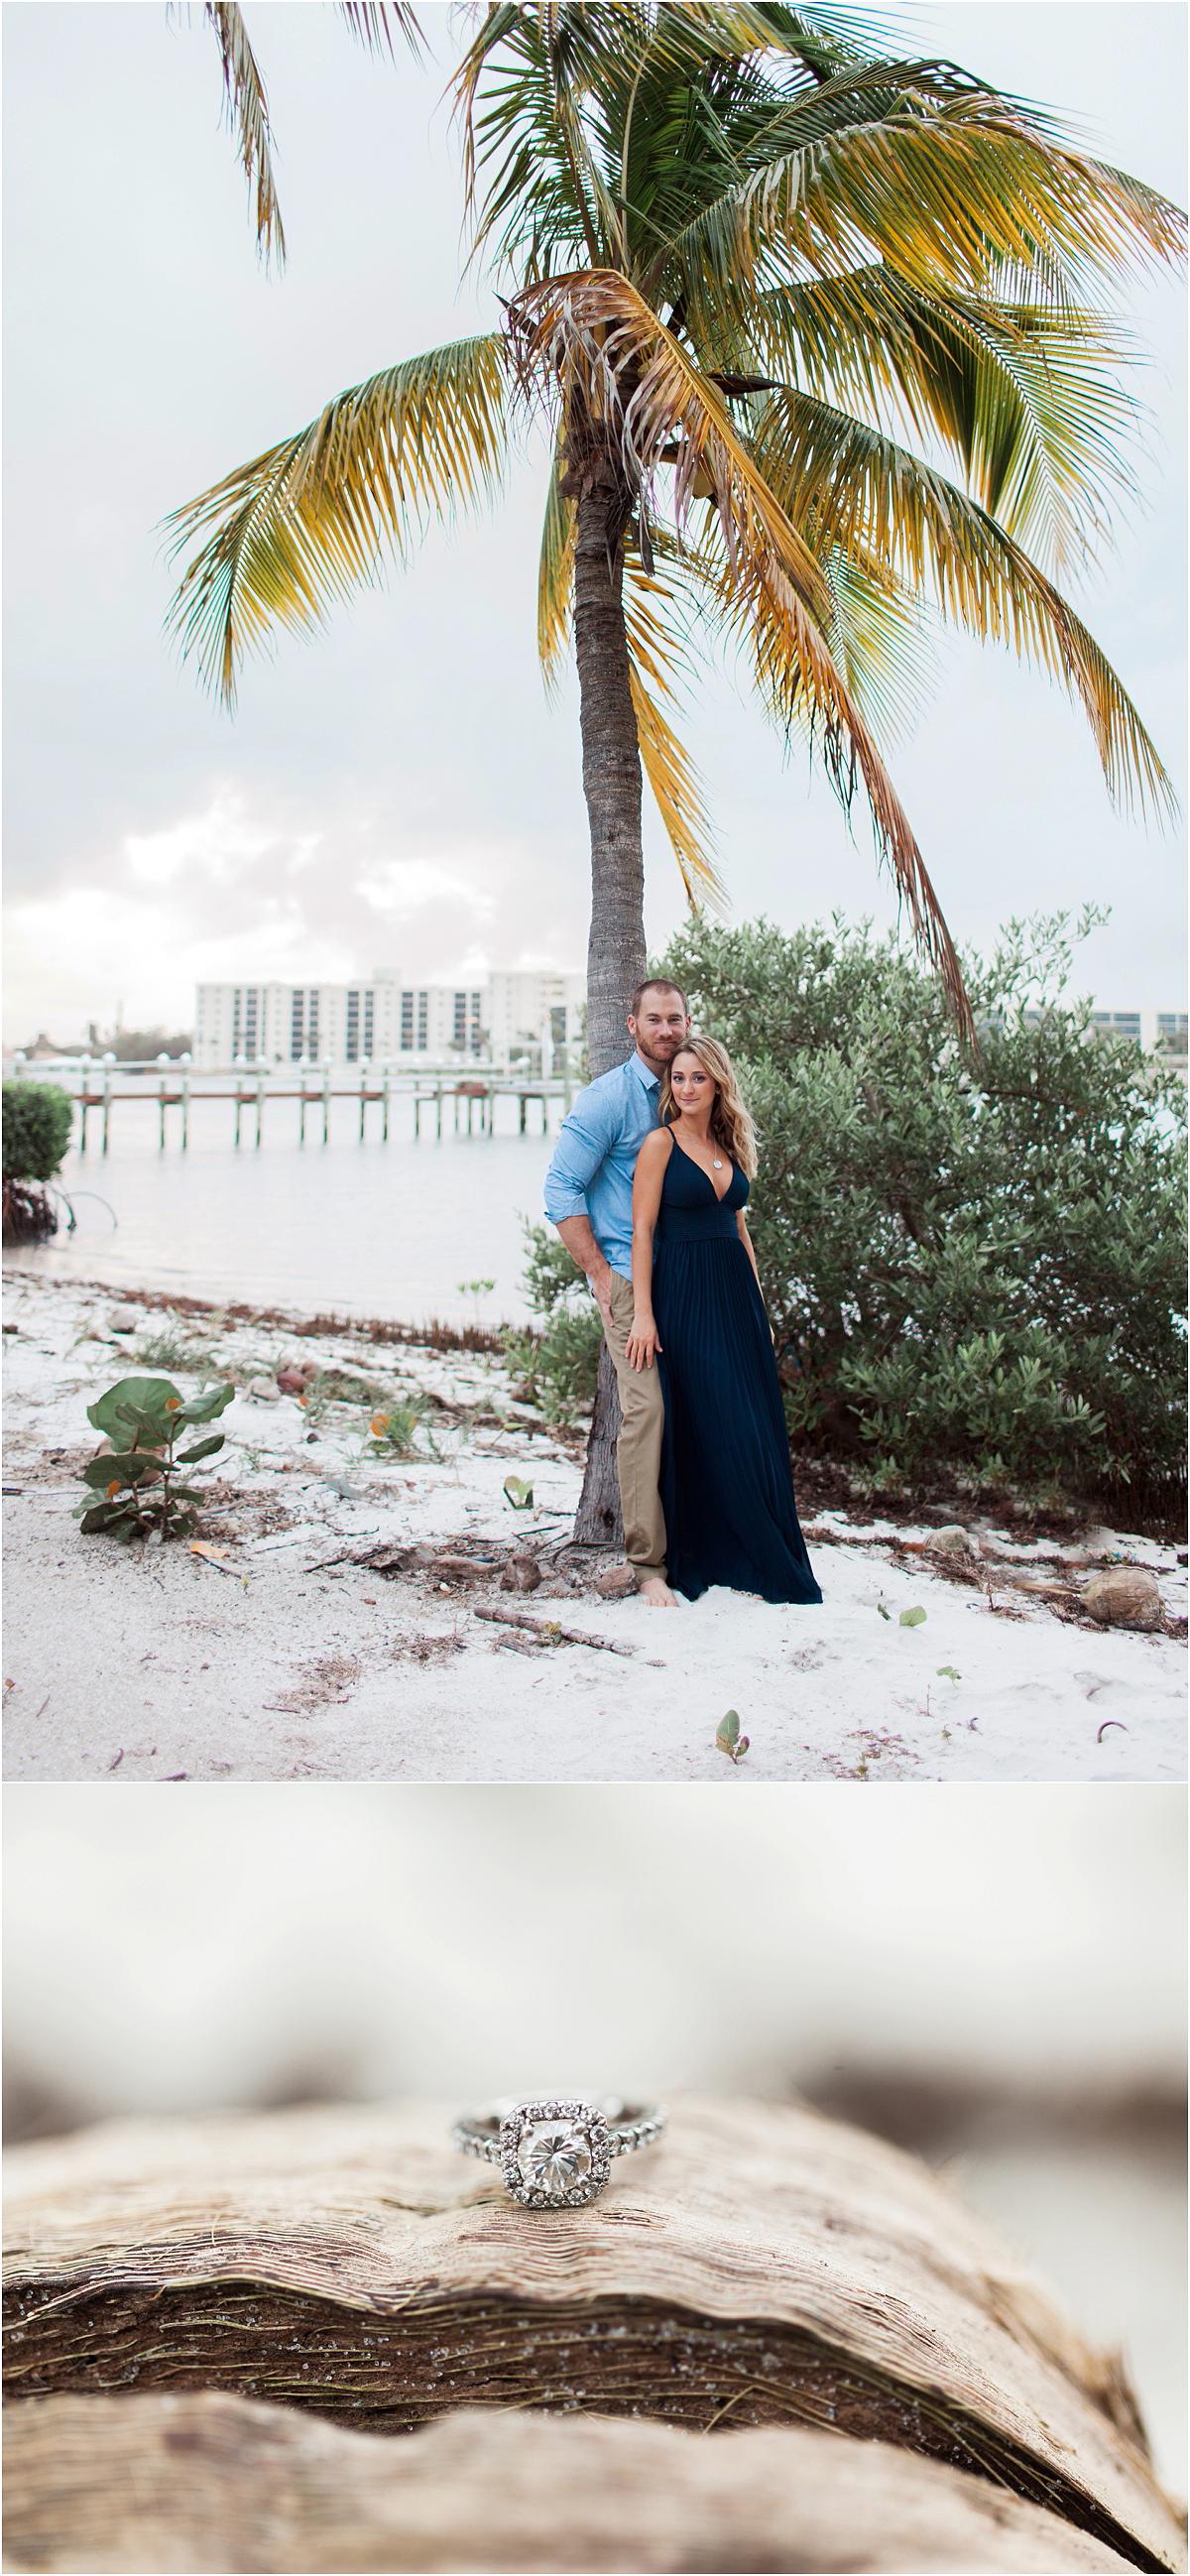 Jupiter-Beach-engagement-photography_0004